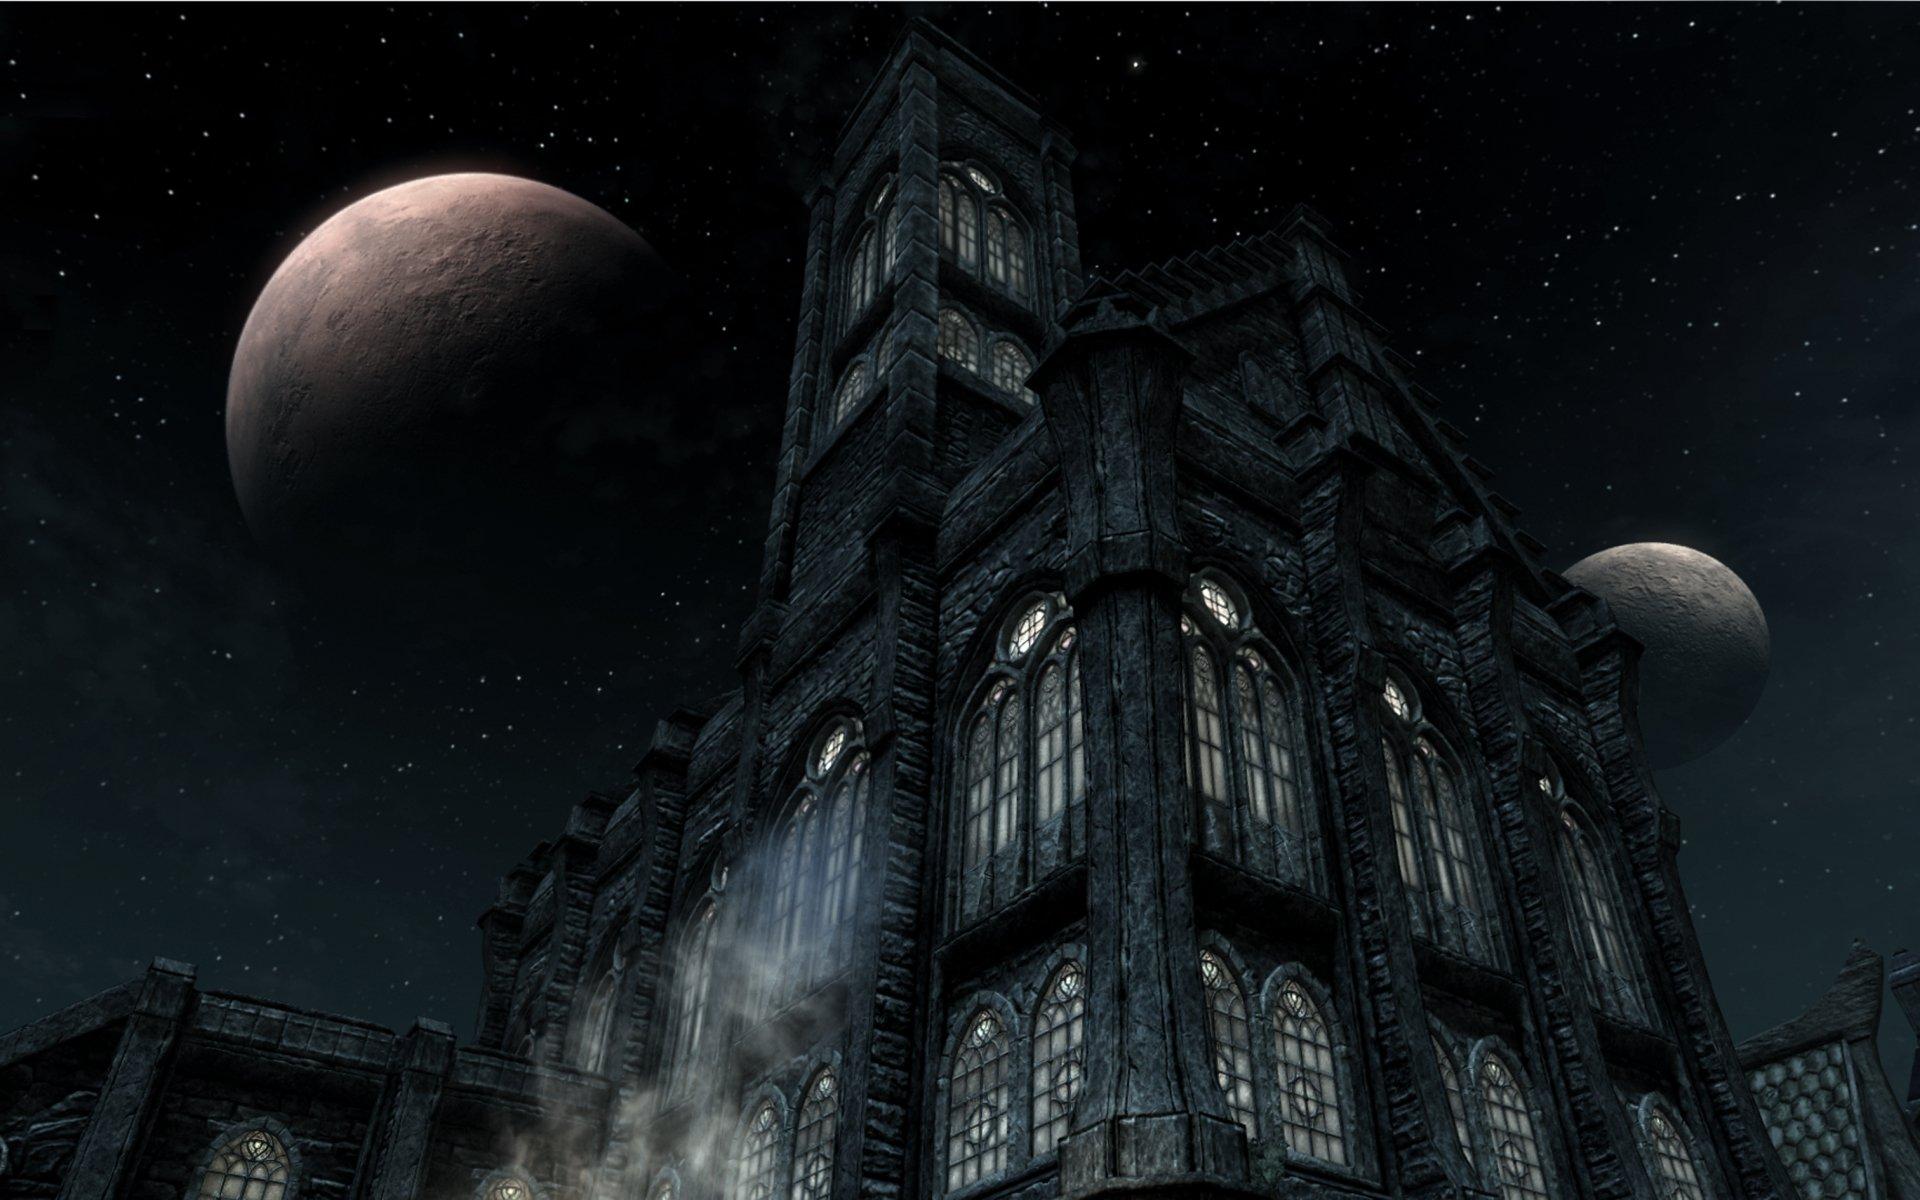 Video Game - The Elder Scrolls V: Skyrim  The Elder Scrolls Skyrim Video Game Wallpaper